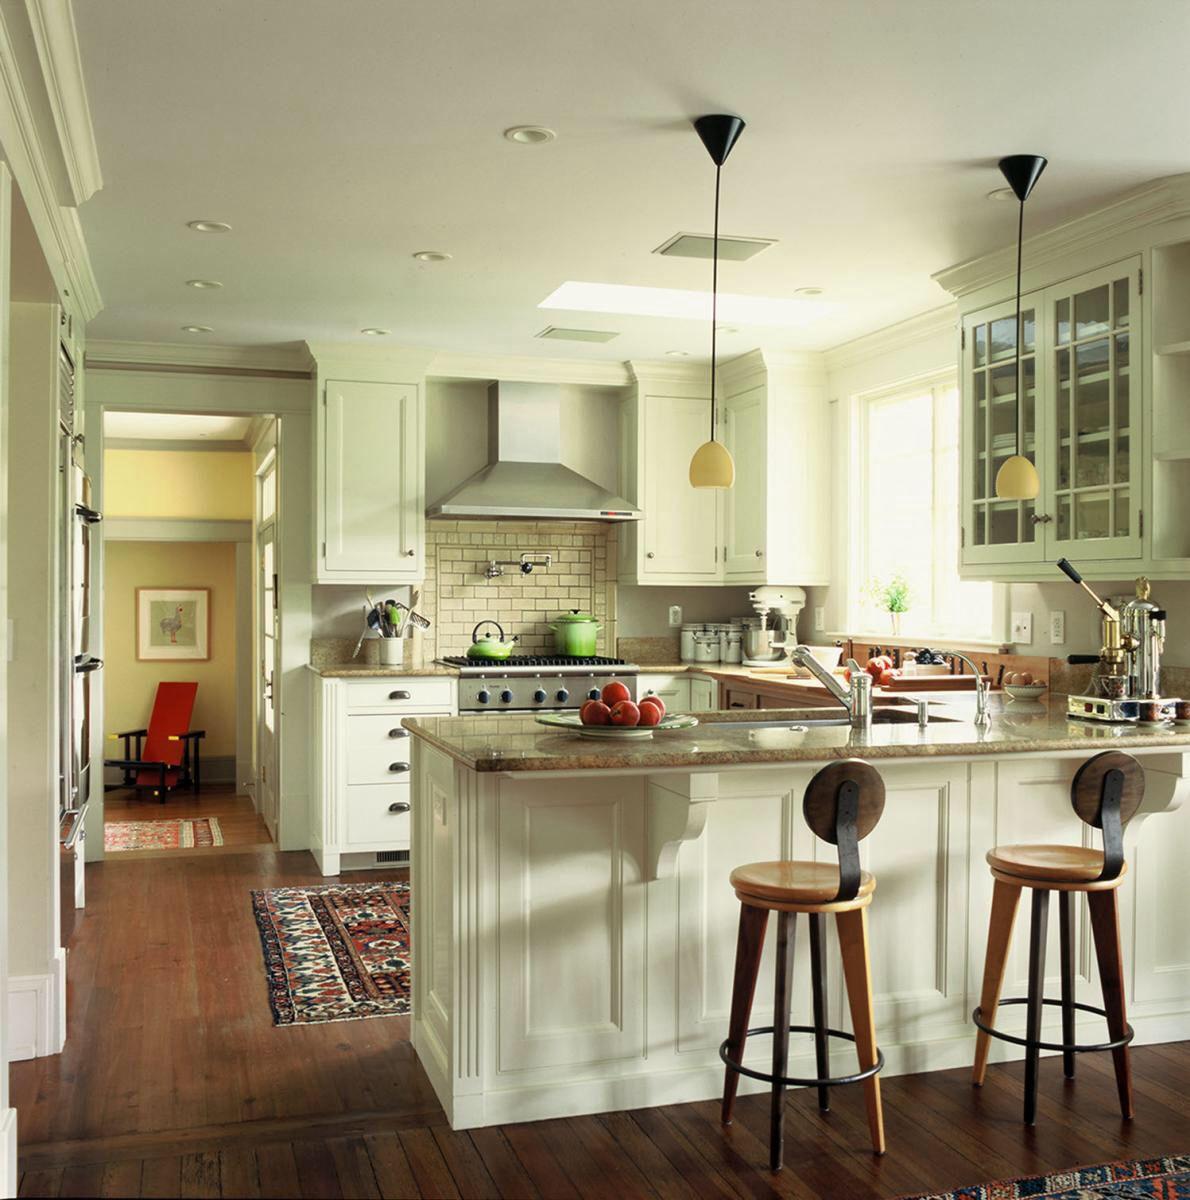 Kitchen Cabinets Pinterest: Farmhouse Kitchen